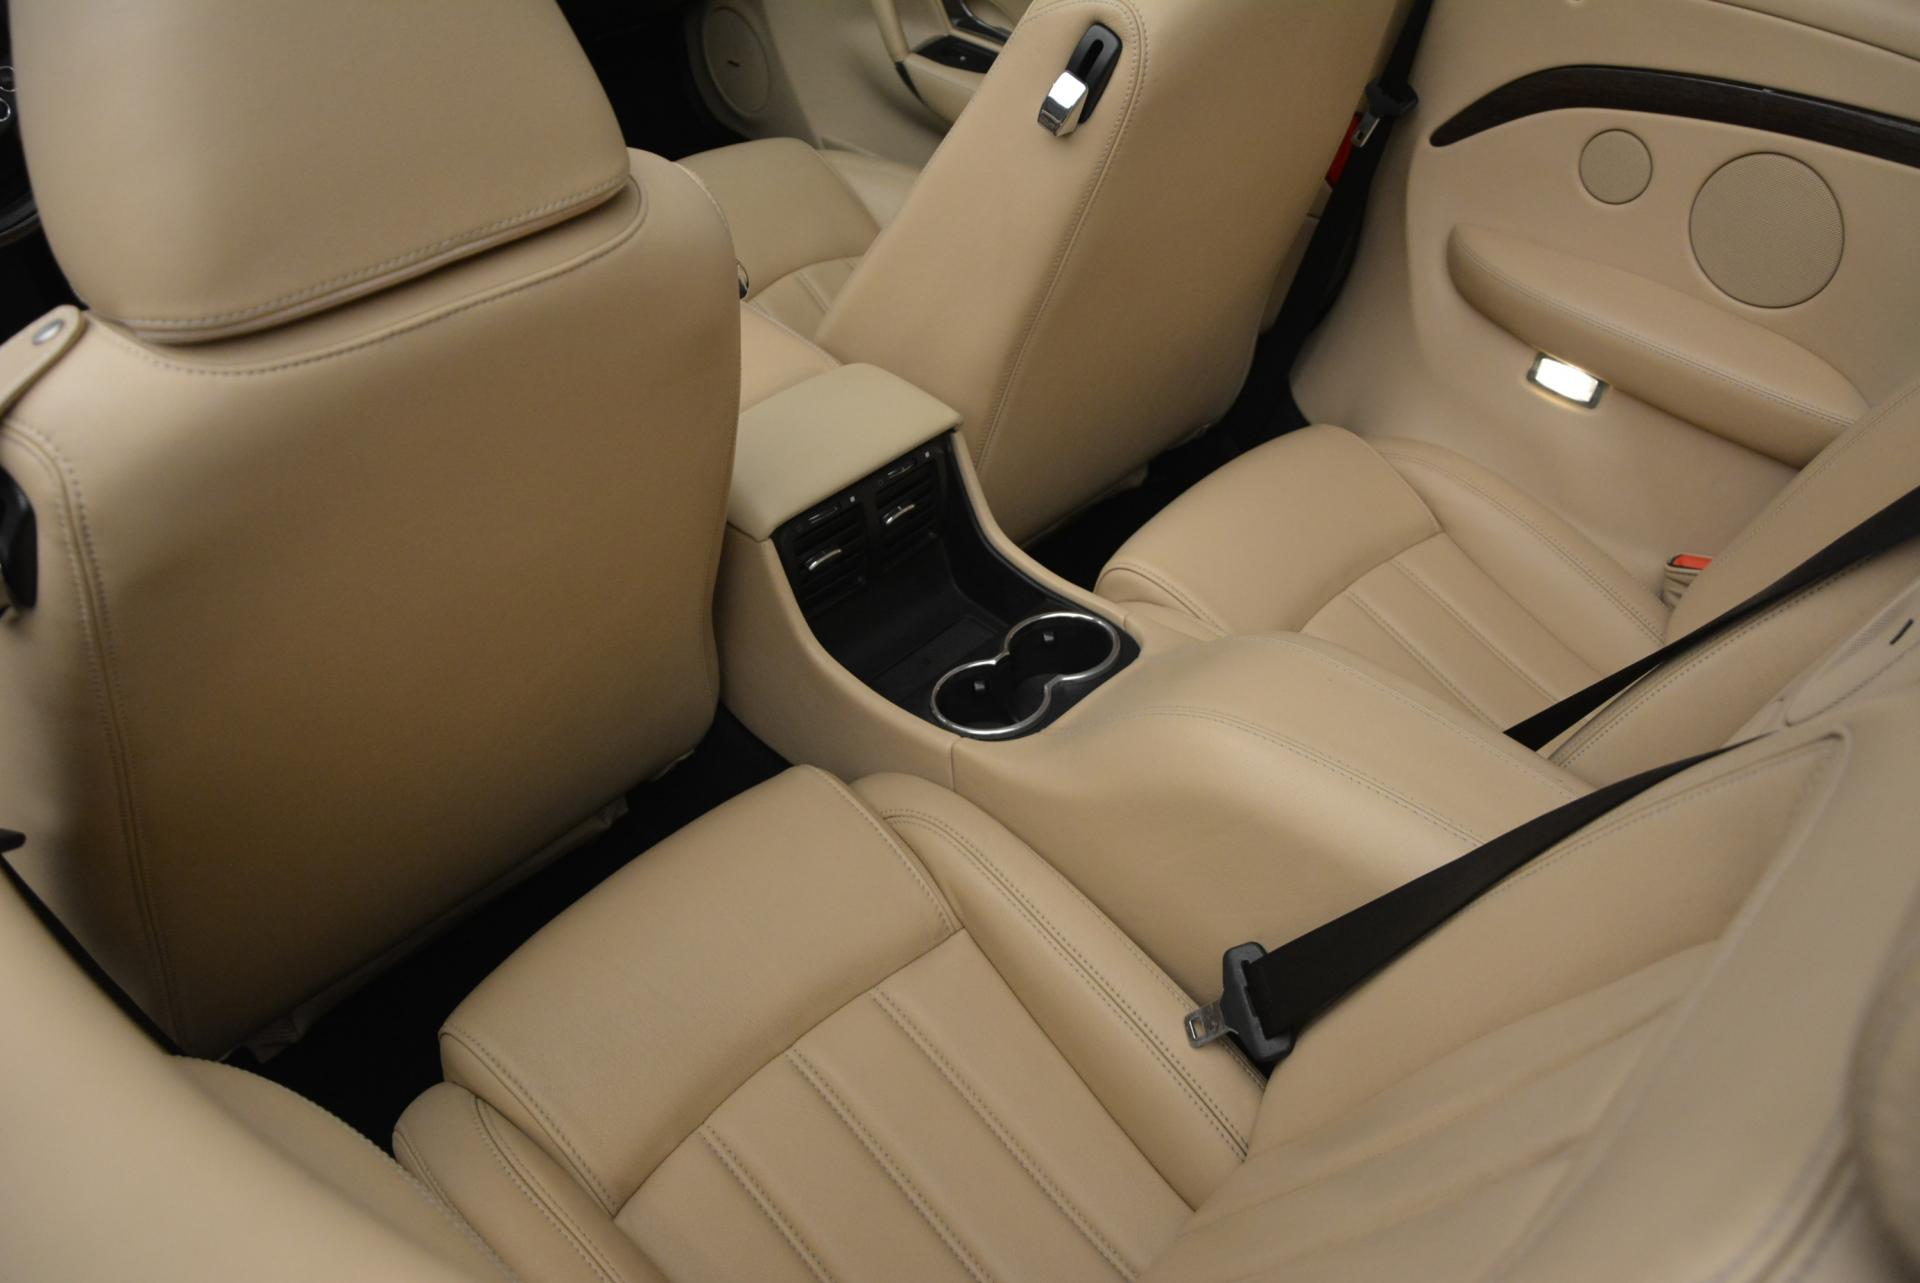 Used 2011 Maserati GranTurismo Base For Sale In Westport, CT 158_p30